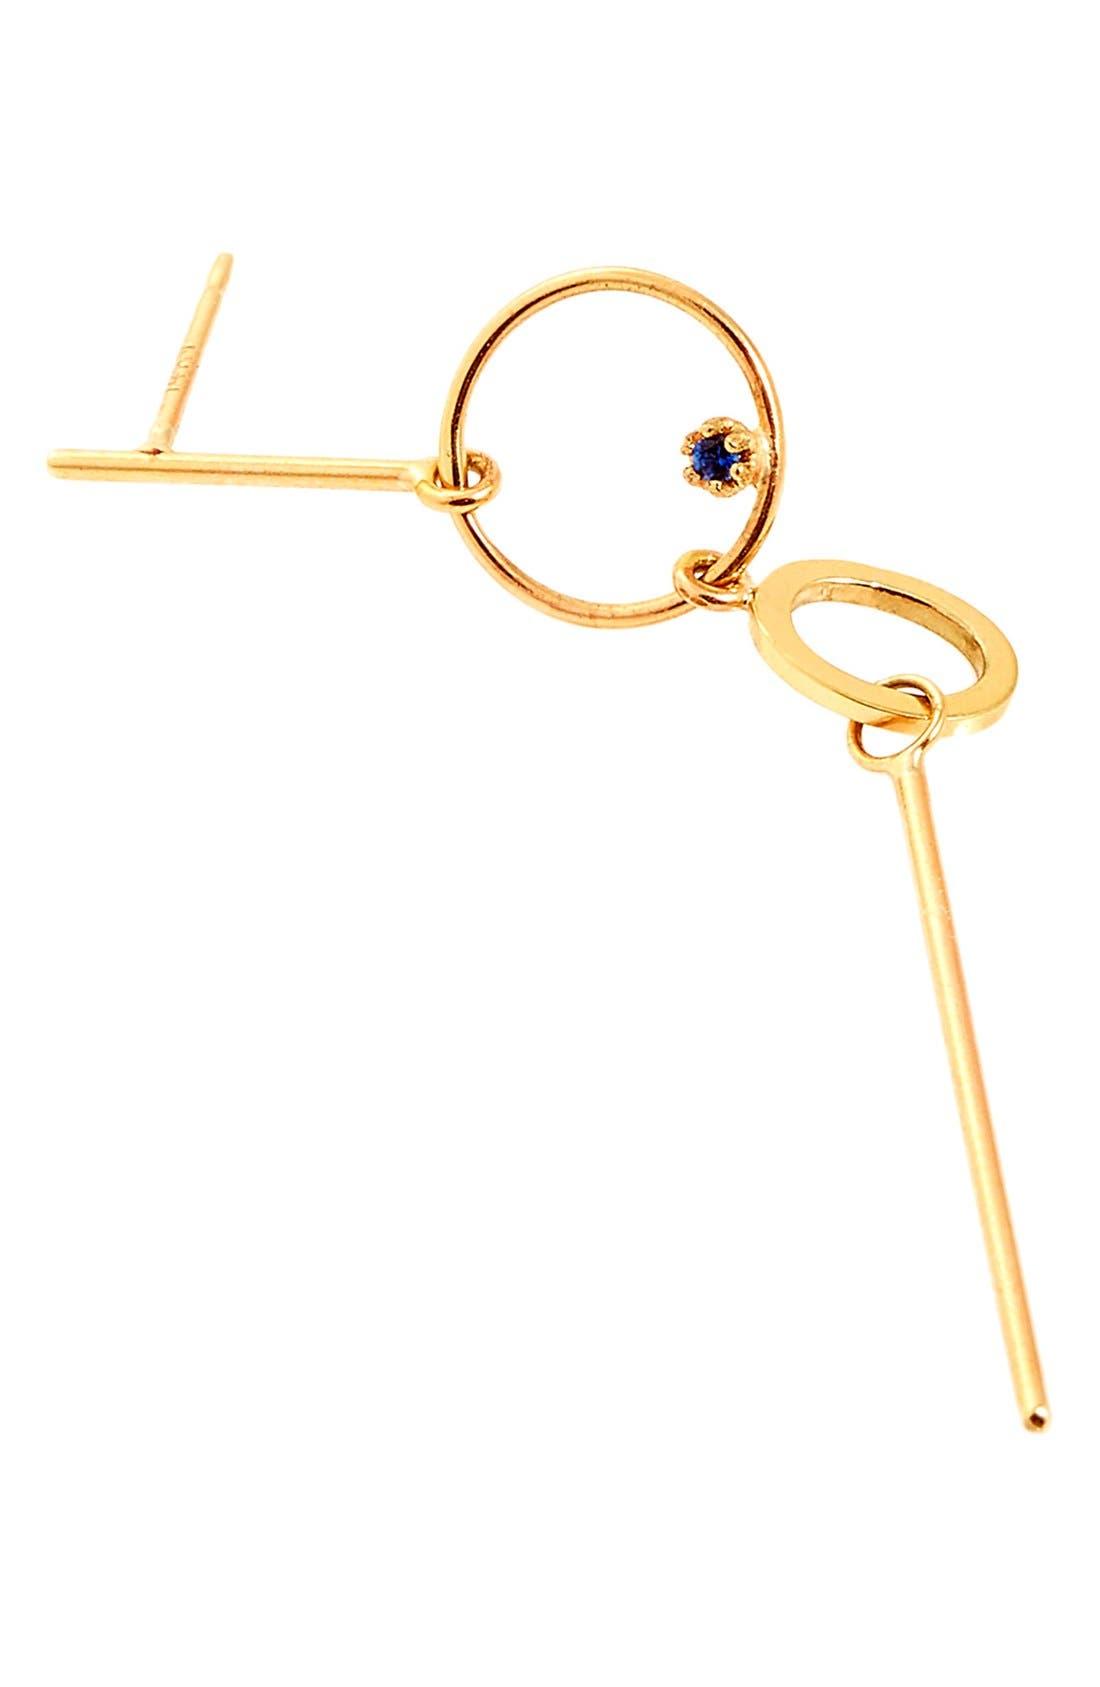 'Long Bubble' Gold & Sapphire Statement Earring,                         Main,                         color, 710